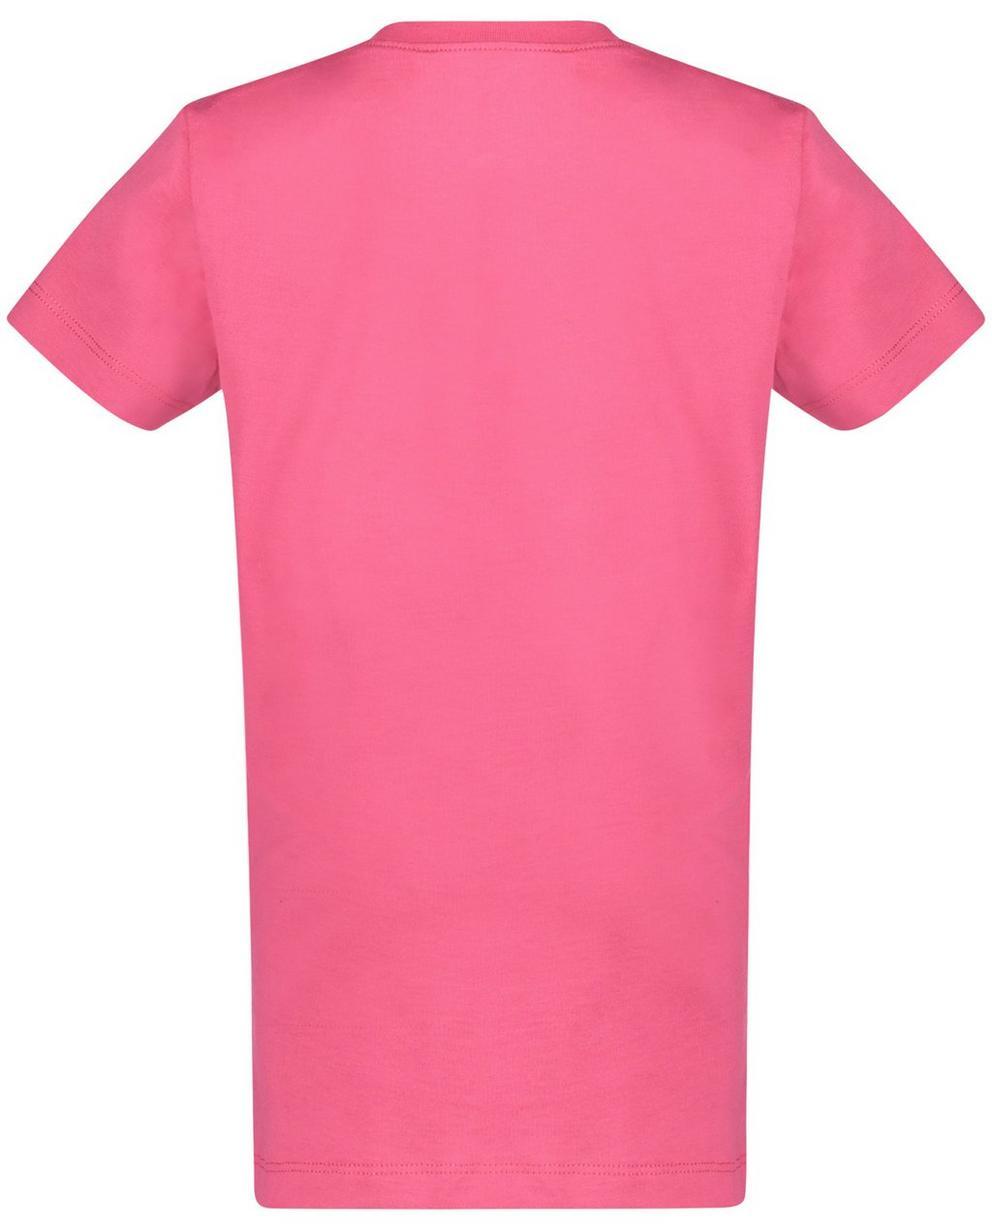 T-shirts - T-shirt met pandaprint